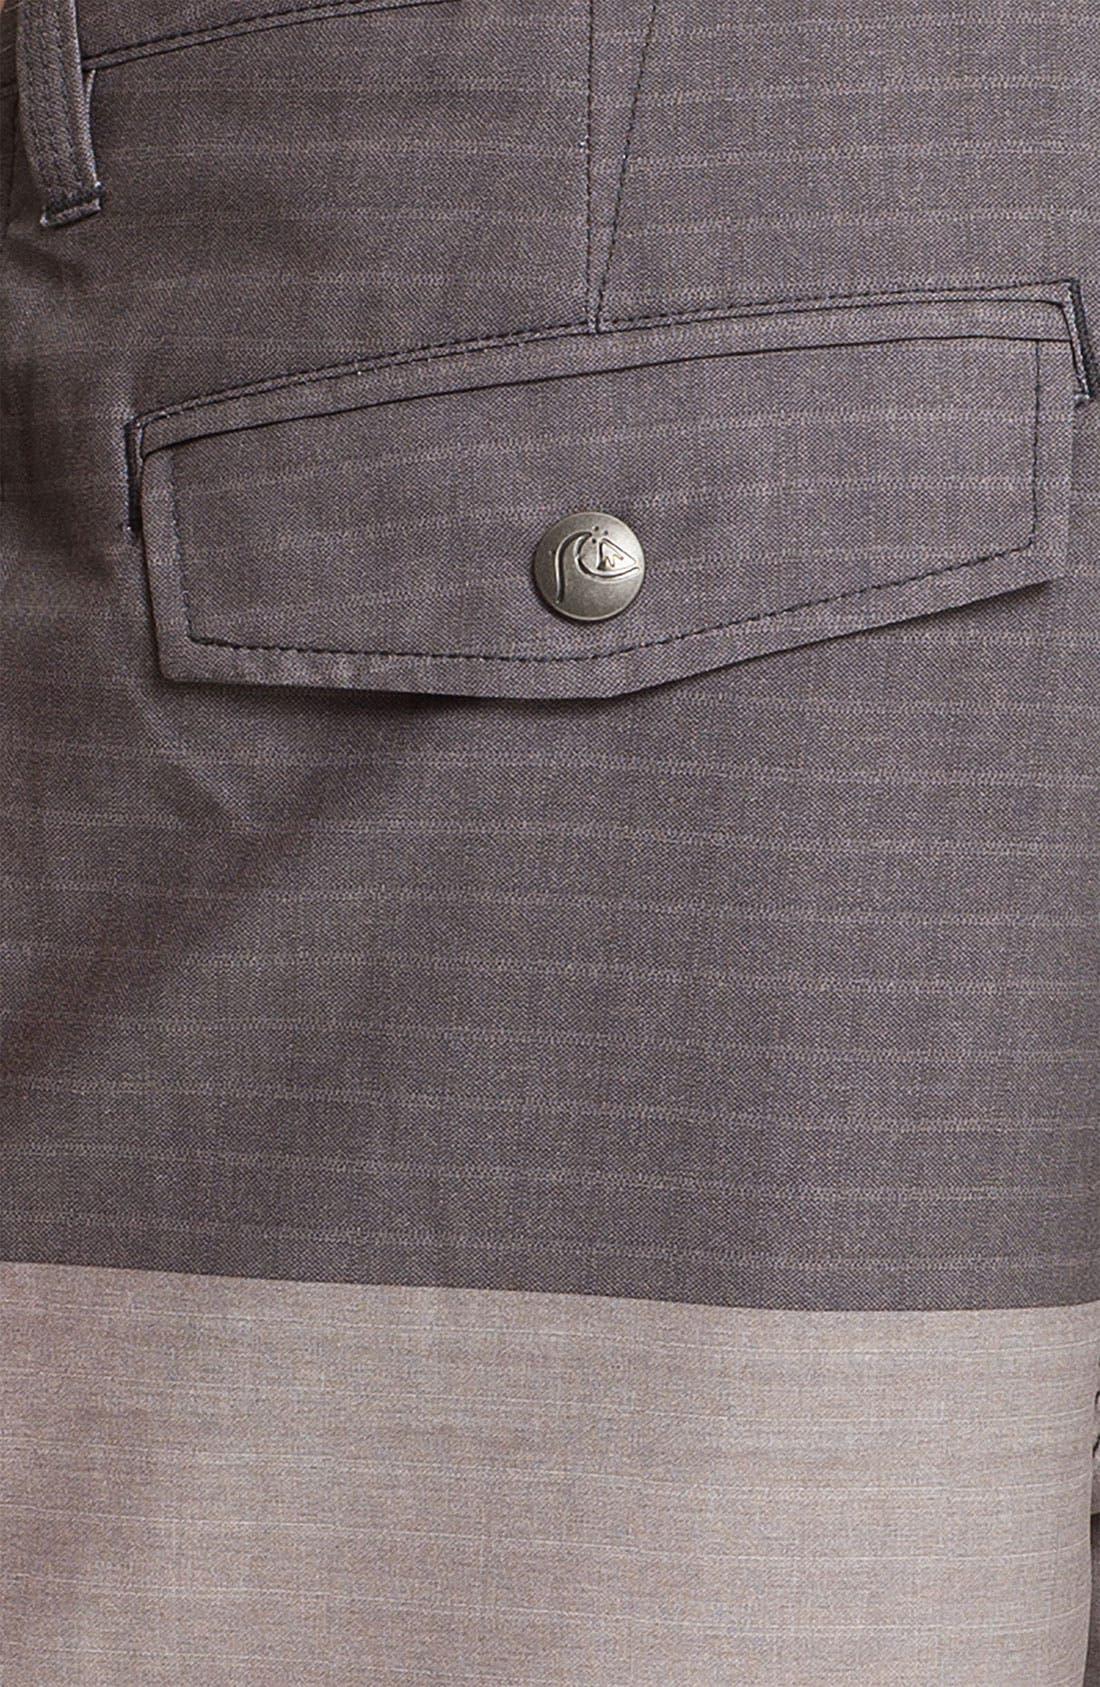 Alternate Image 3  - Quiksilver 'Platypus' Shorts